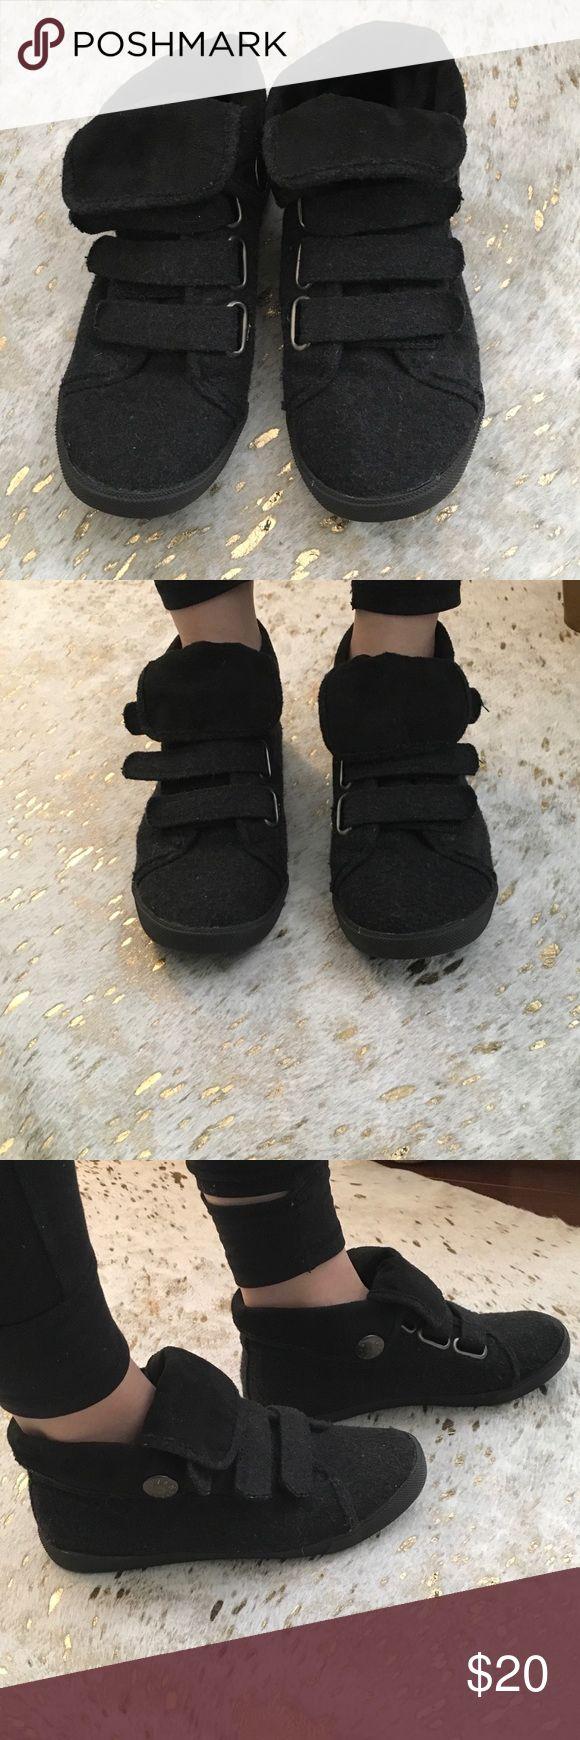 Blowfish sneakers Dark grey wool velcro Blowfish sneakers, worn twice in excellent condition! Size 6 Blowfish Shoes Sneakers